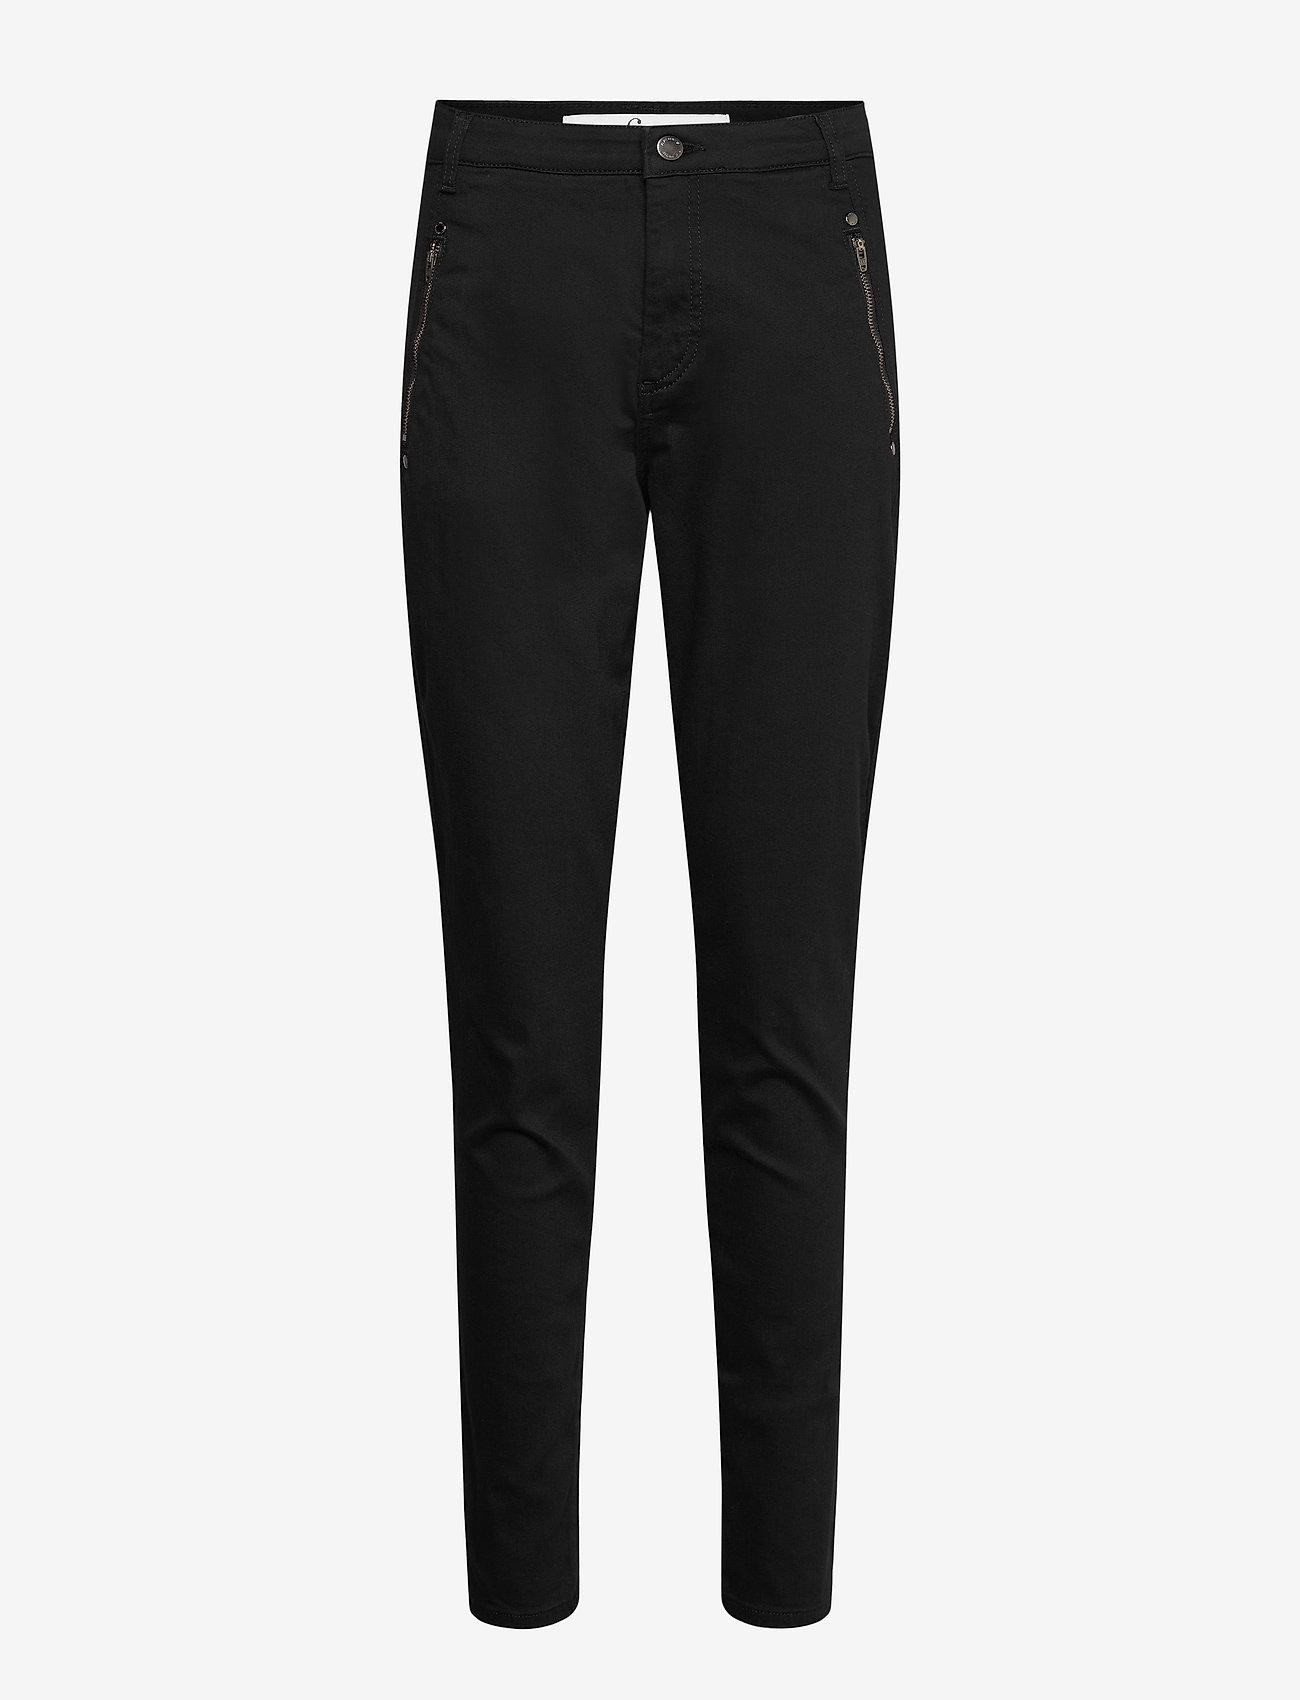 FIVEUNITS - Jolie 455 Drifter - slim jeans - black raini - 1